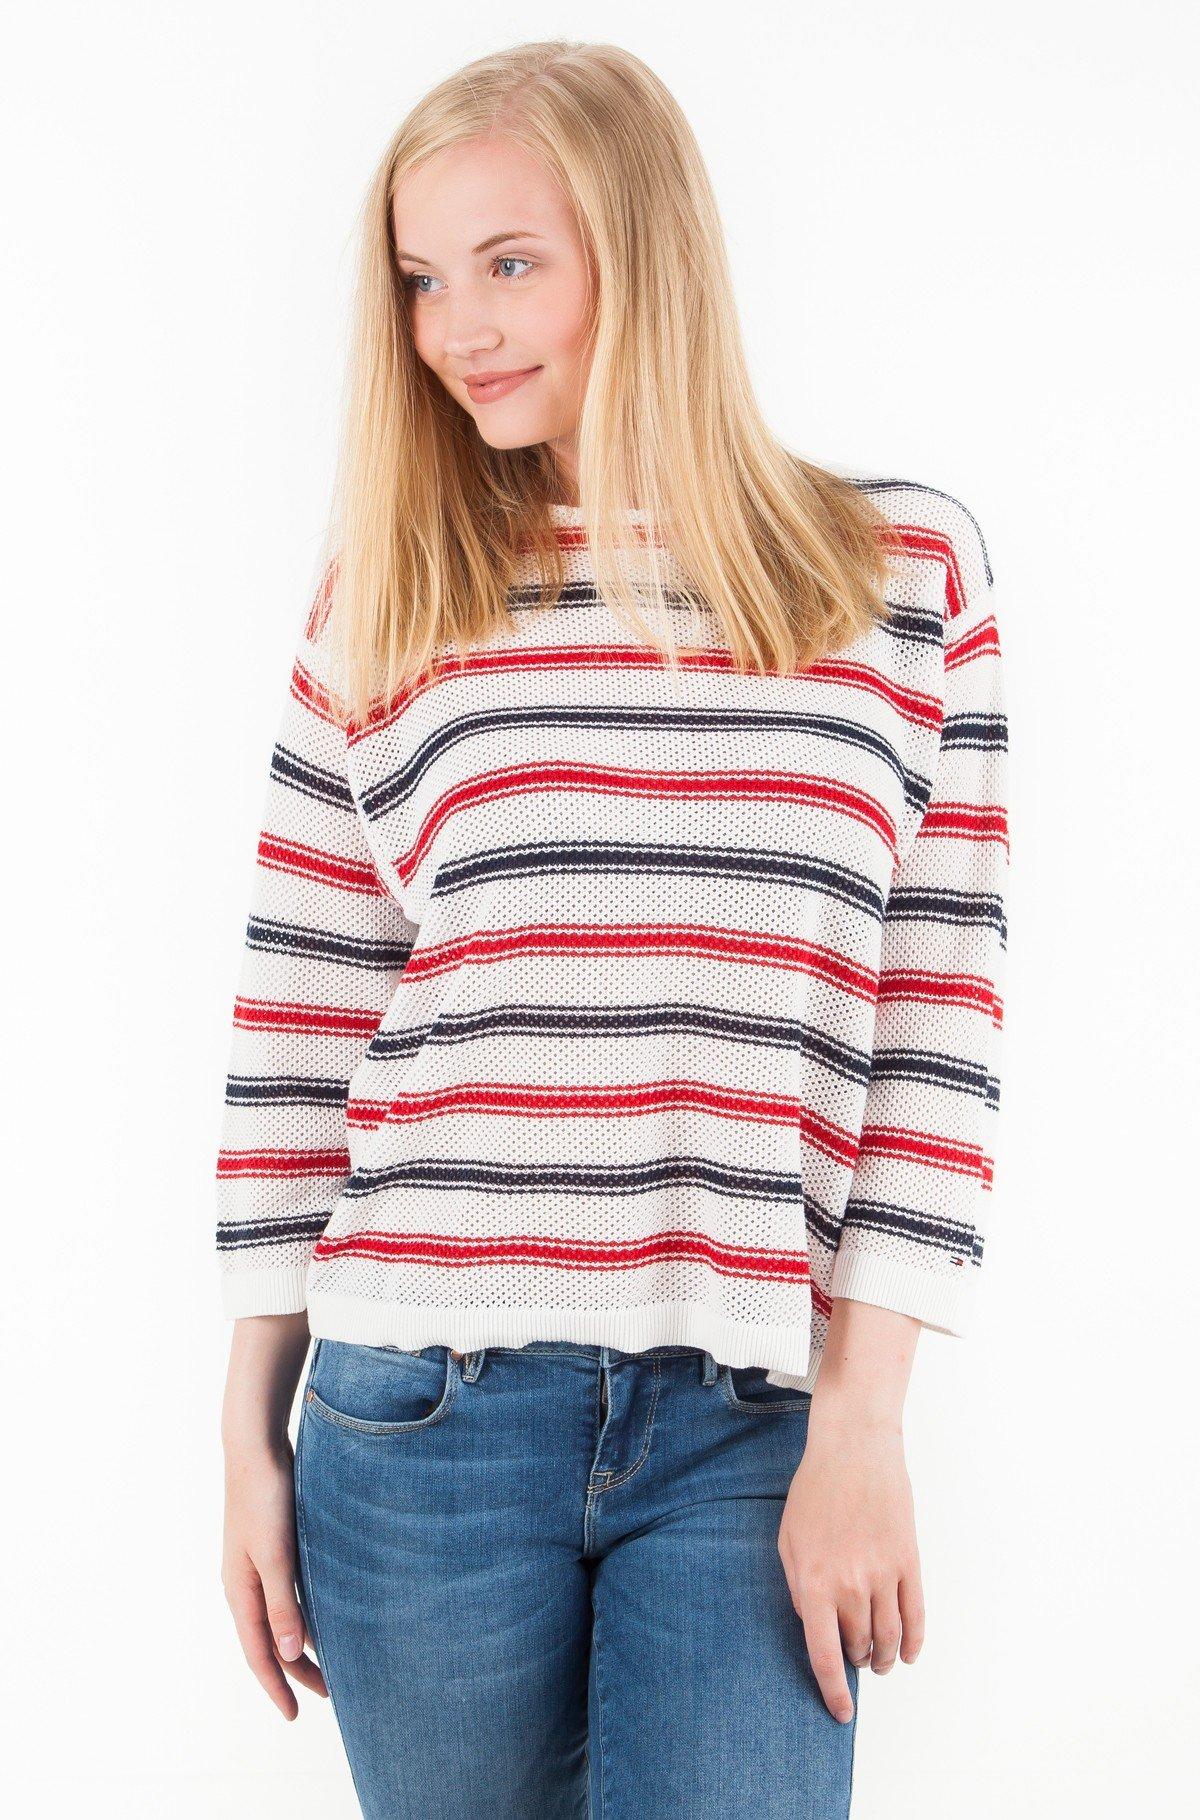 Sweater TJW MULTICOLOR STRIPE SWEATER-full-1